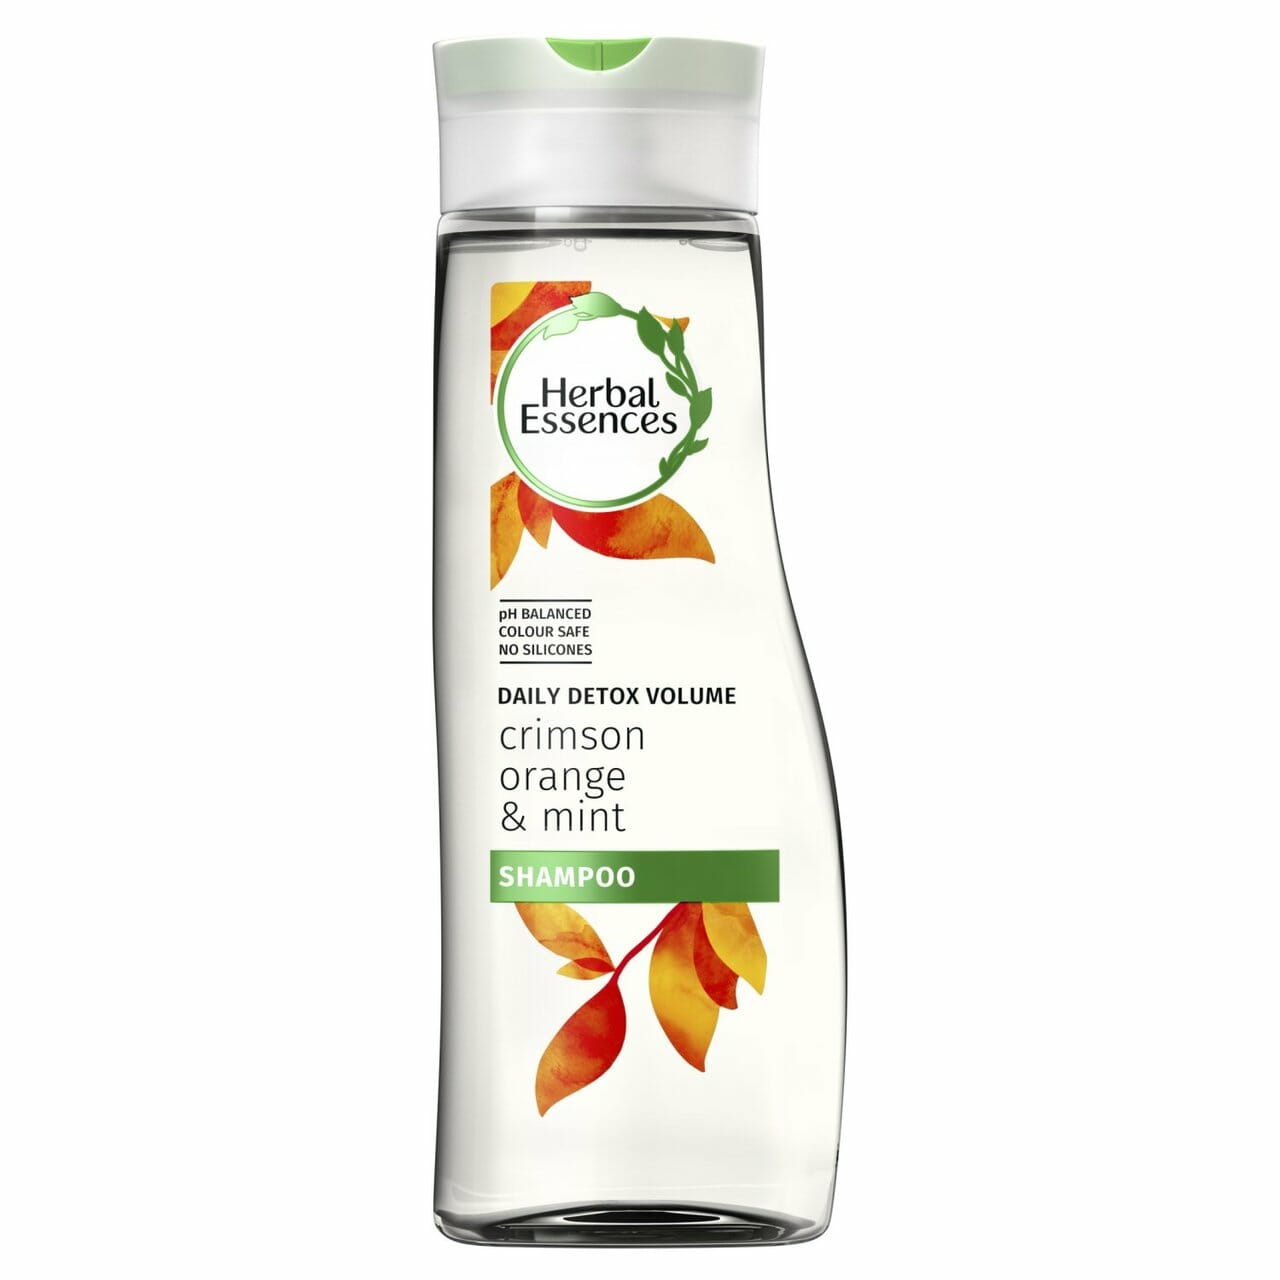 Herbal Essences Crimson Orange & Mint Shampoo 400ml - best mild shampoo in Pakistan